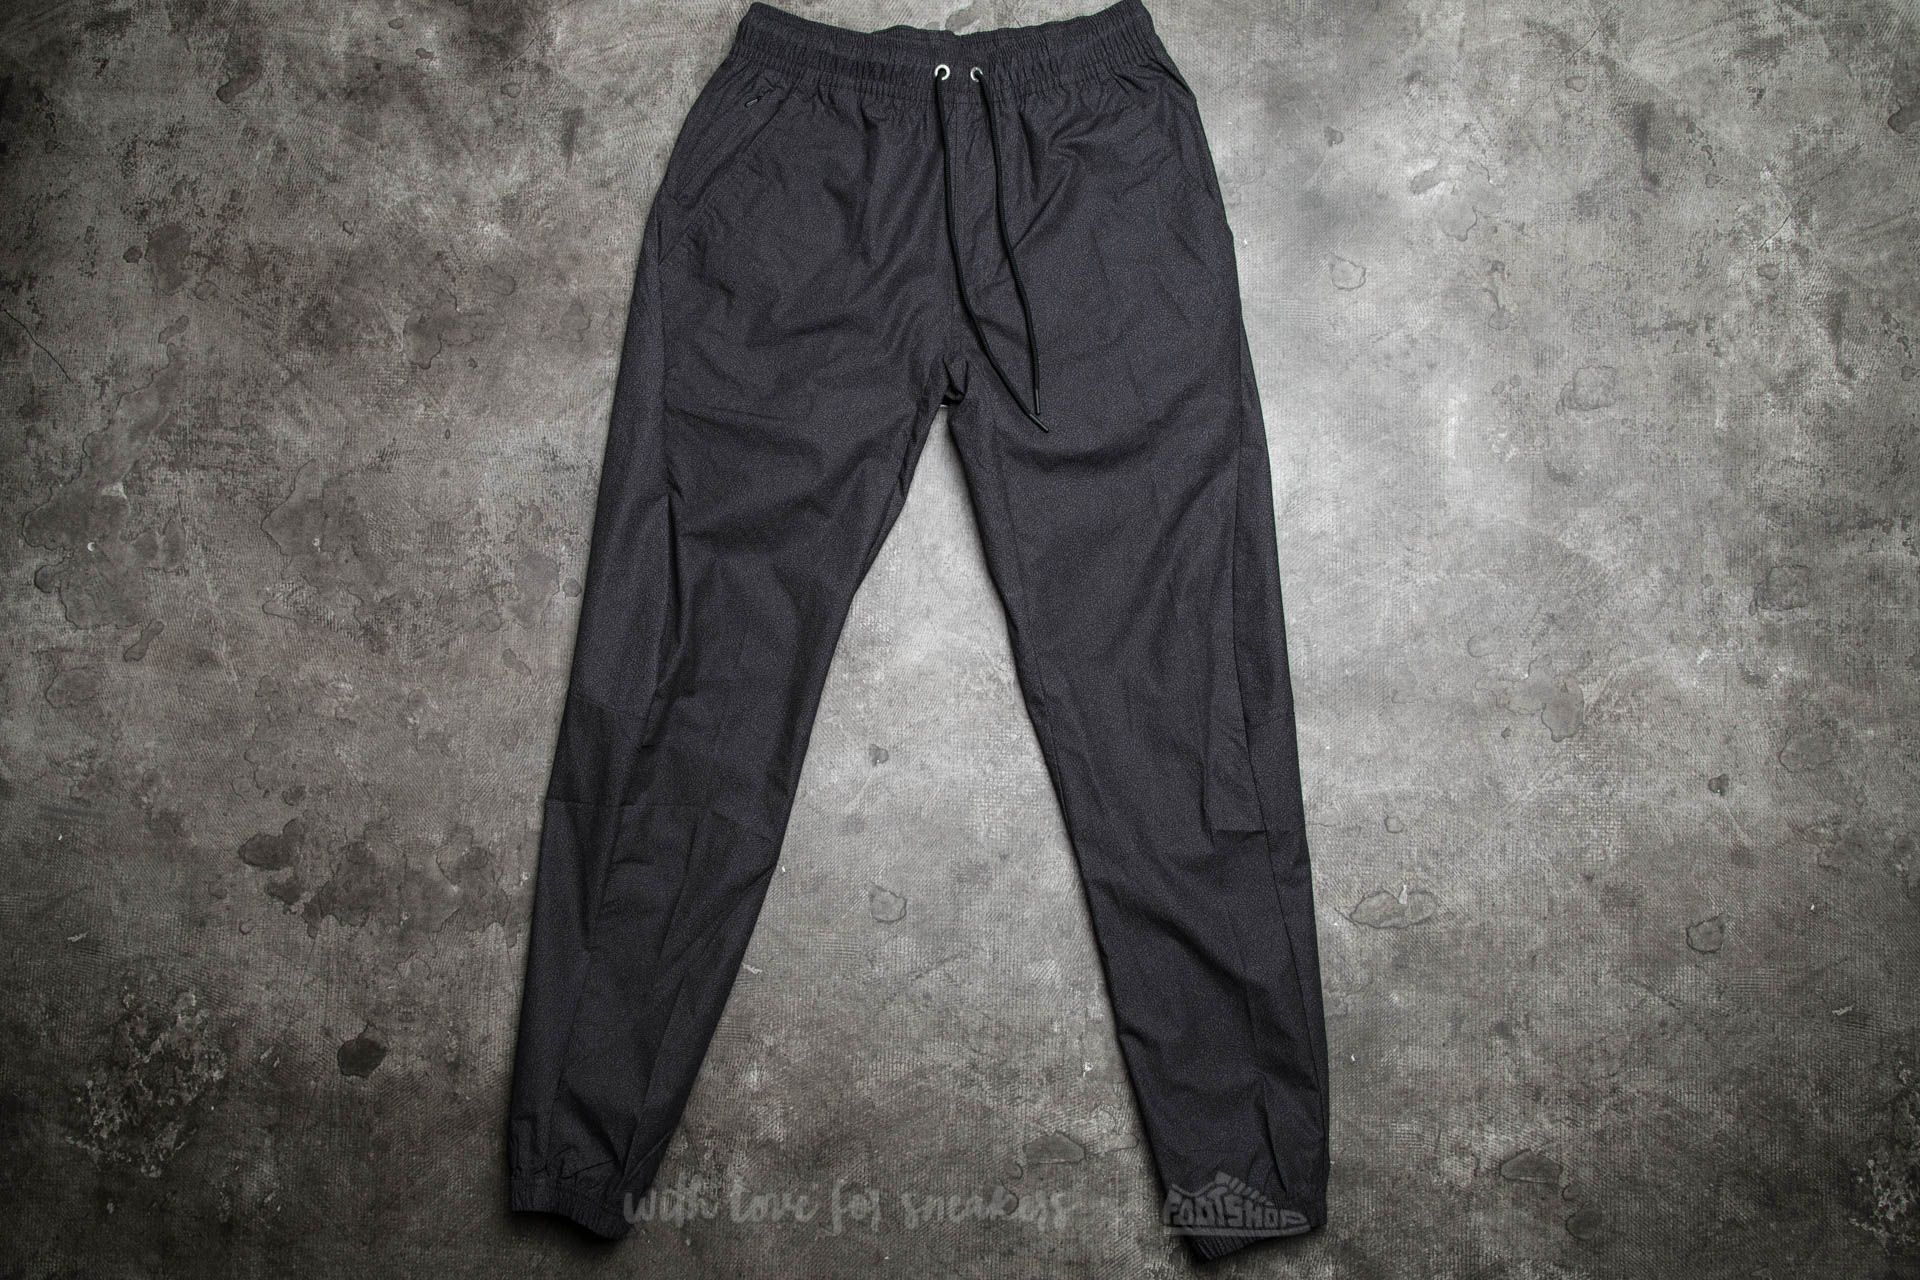 2d67838d752e58 Jordan City Printed Pants Black